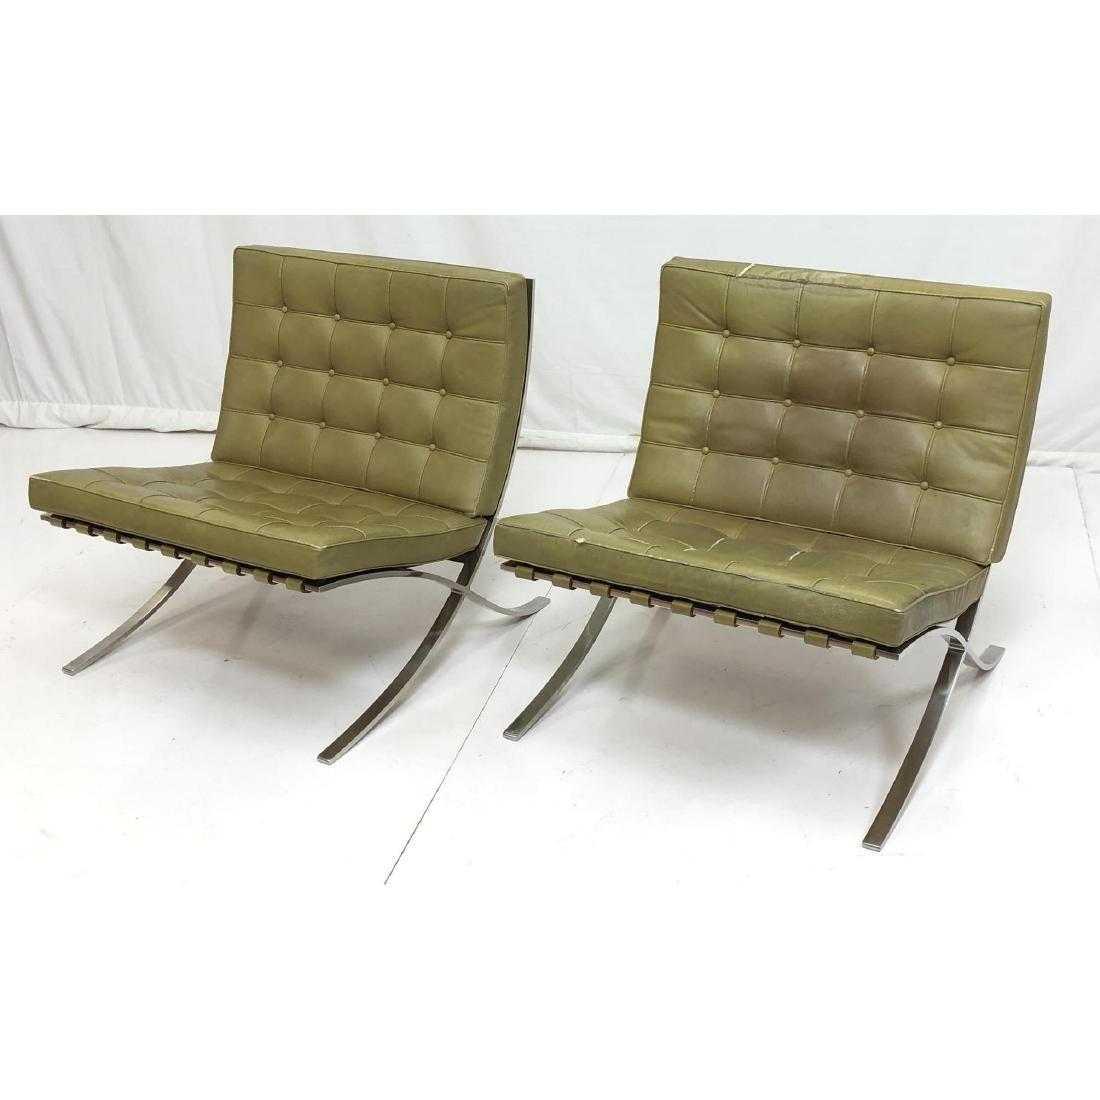 Pr Knoll Mies Van Der Rohe Barcelona Lounge Chair